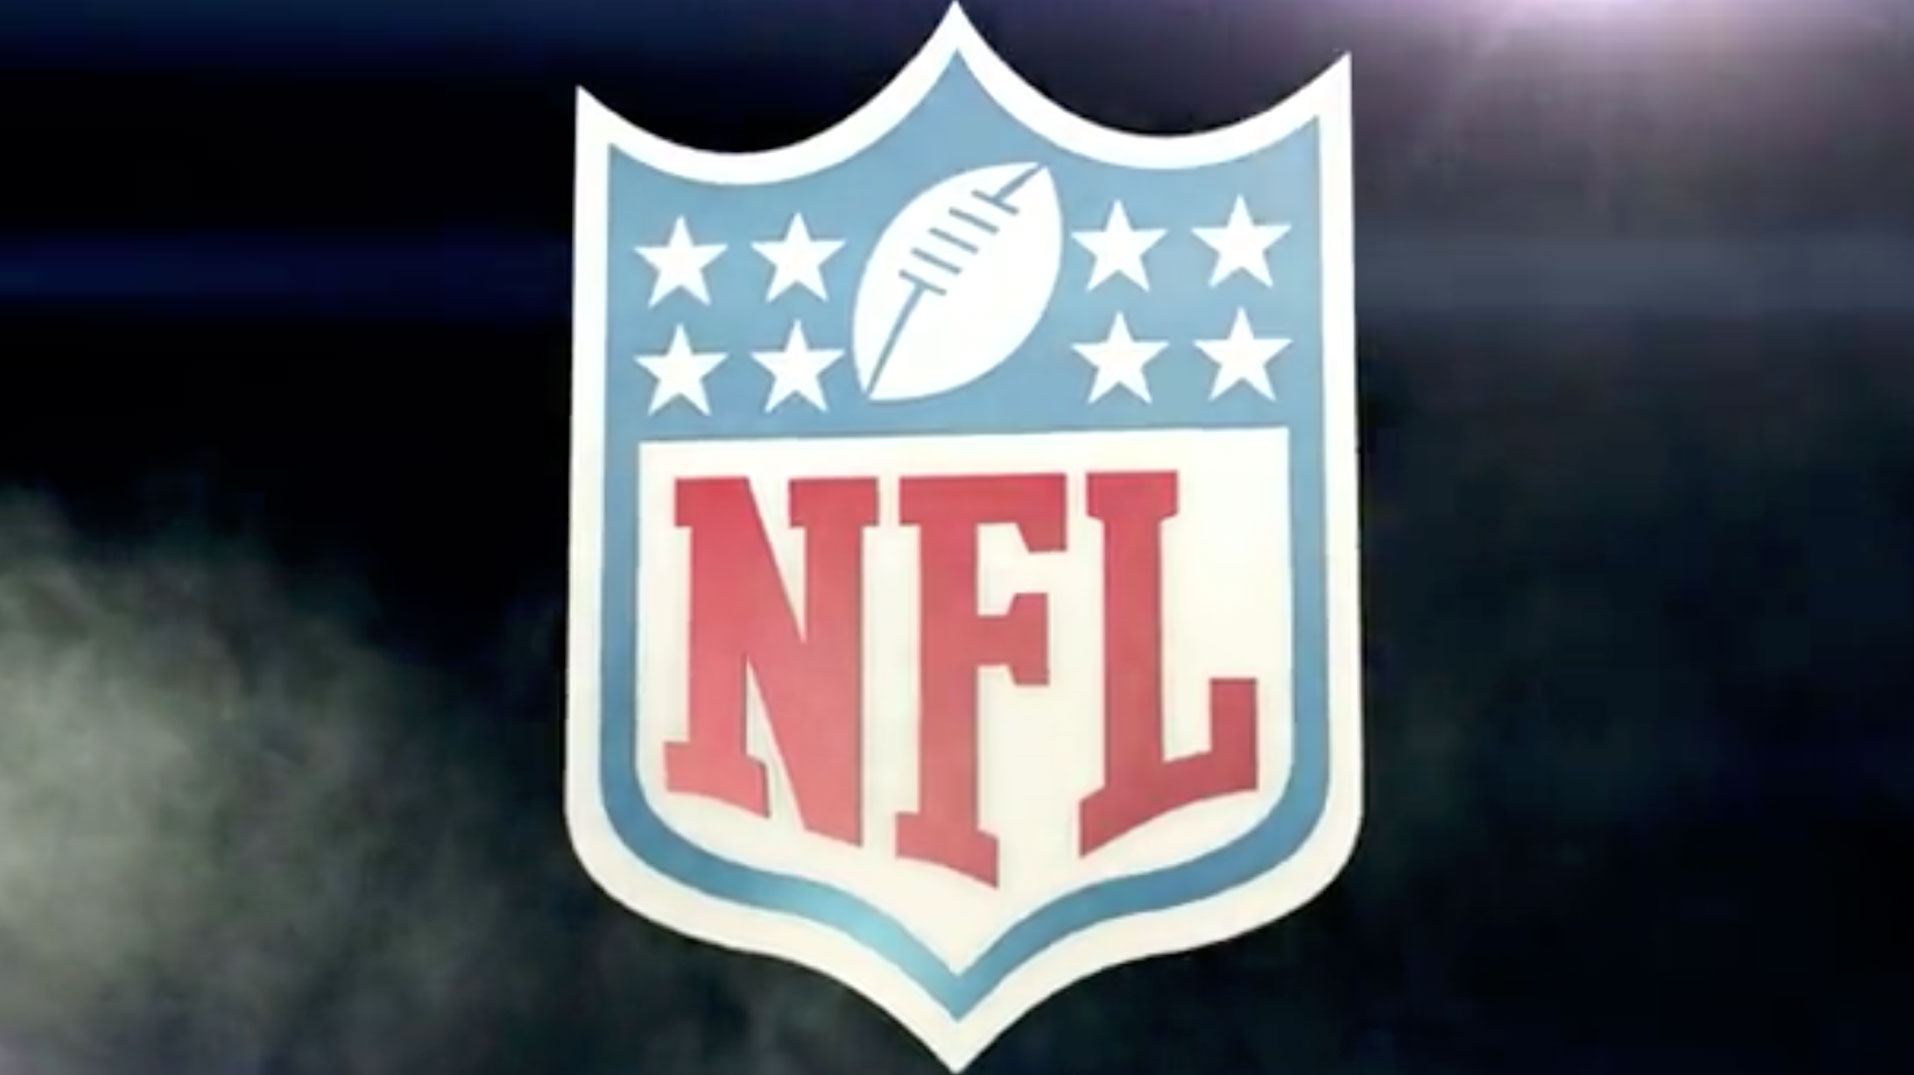 KXTG NFL